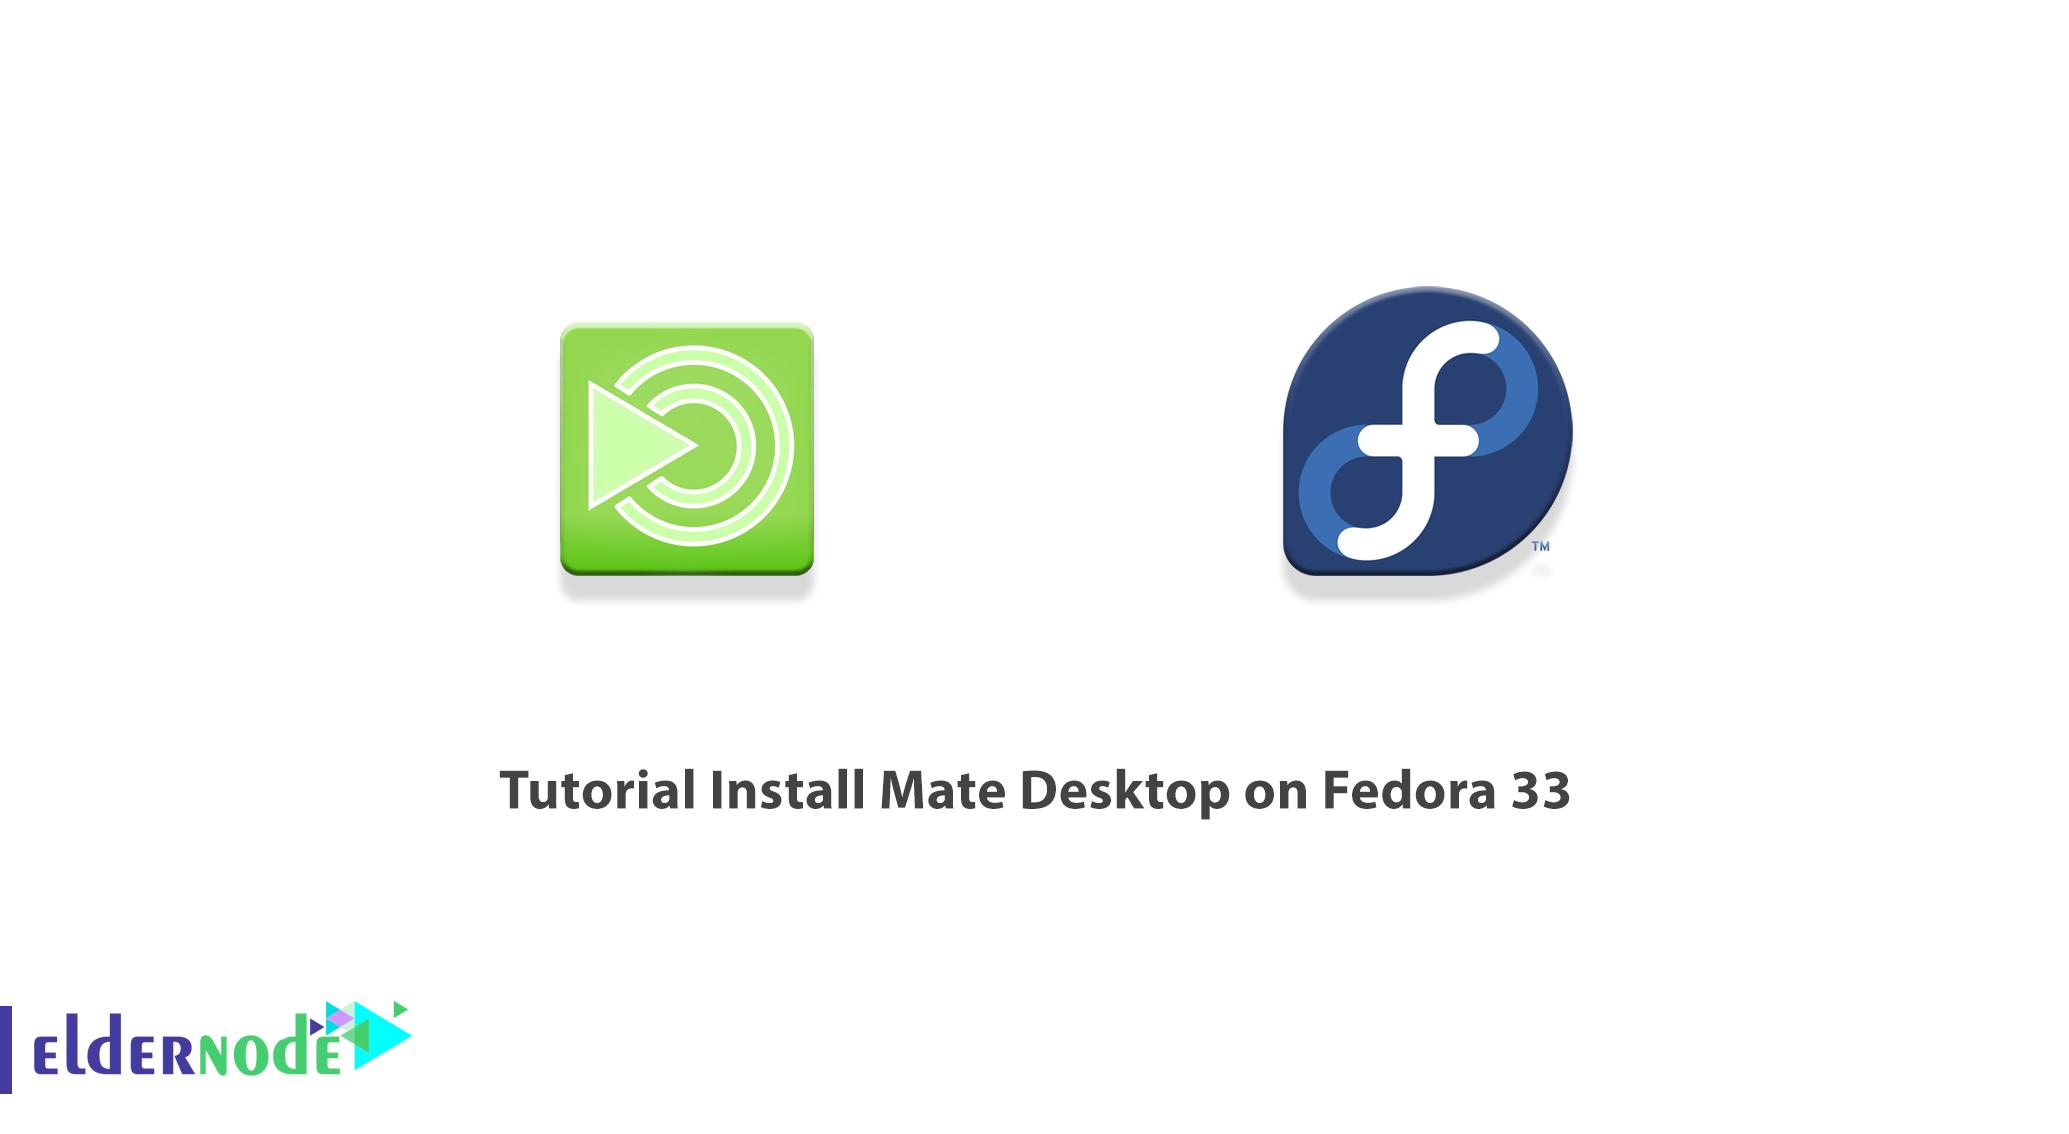 Tutorial Install Mate Desktop on Fedora 33